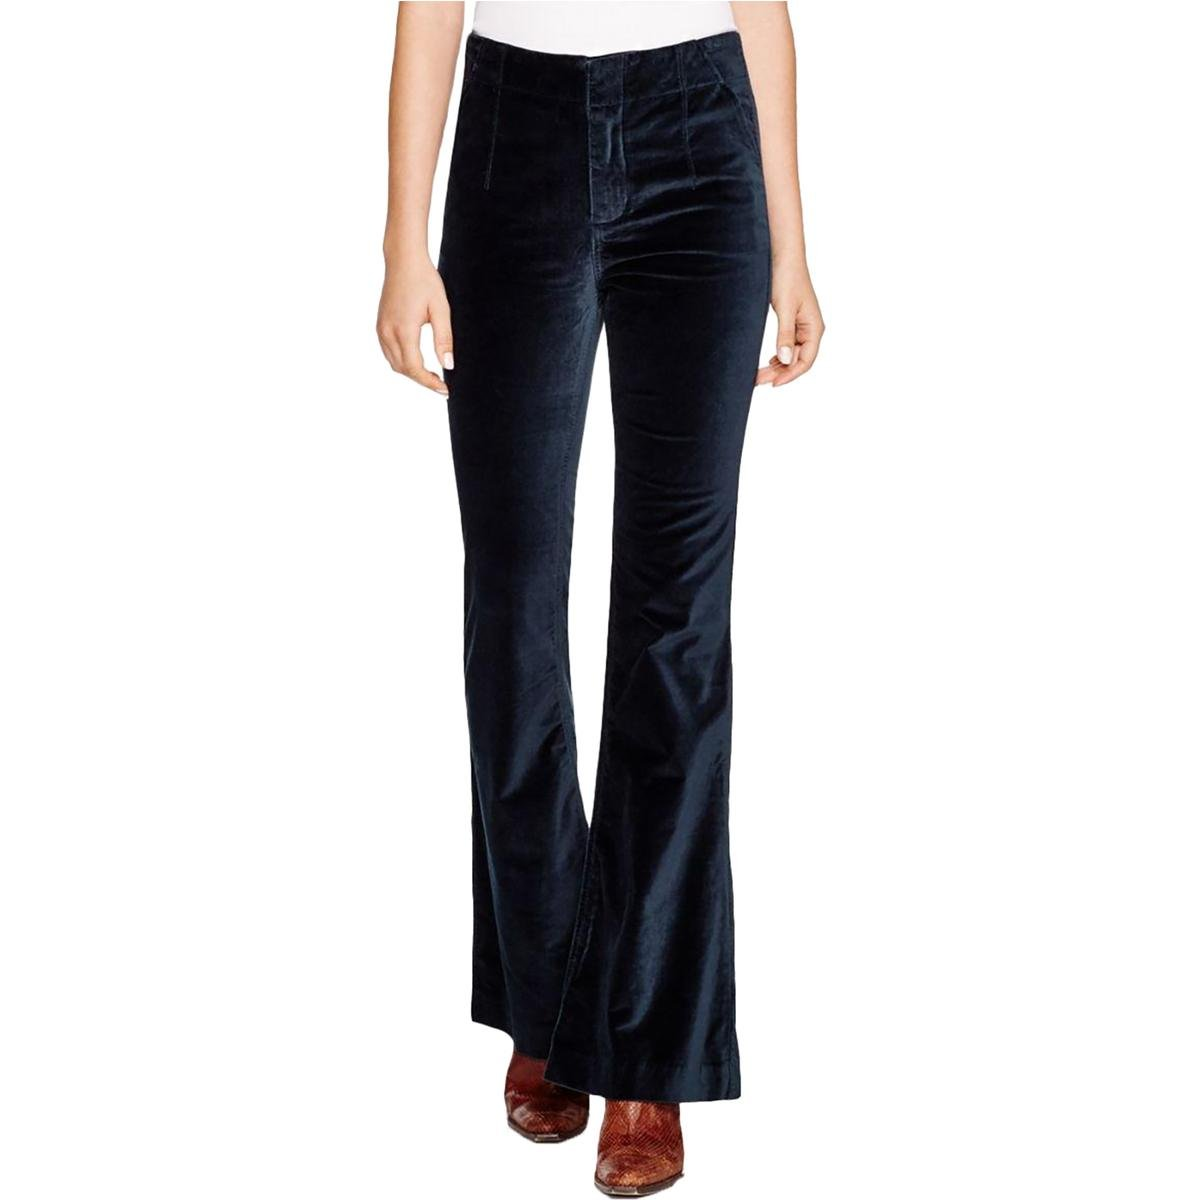 Free People Womens Oxanna Velvet Flare Leg Casual Pants Green 29